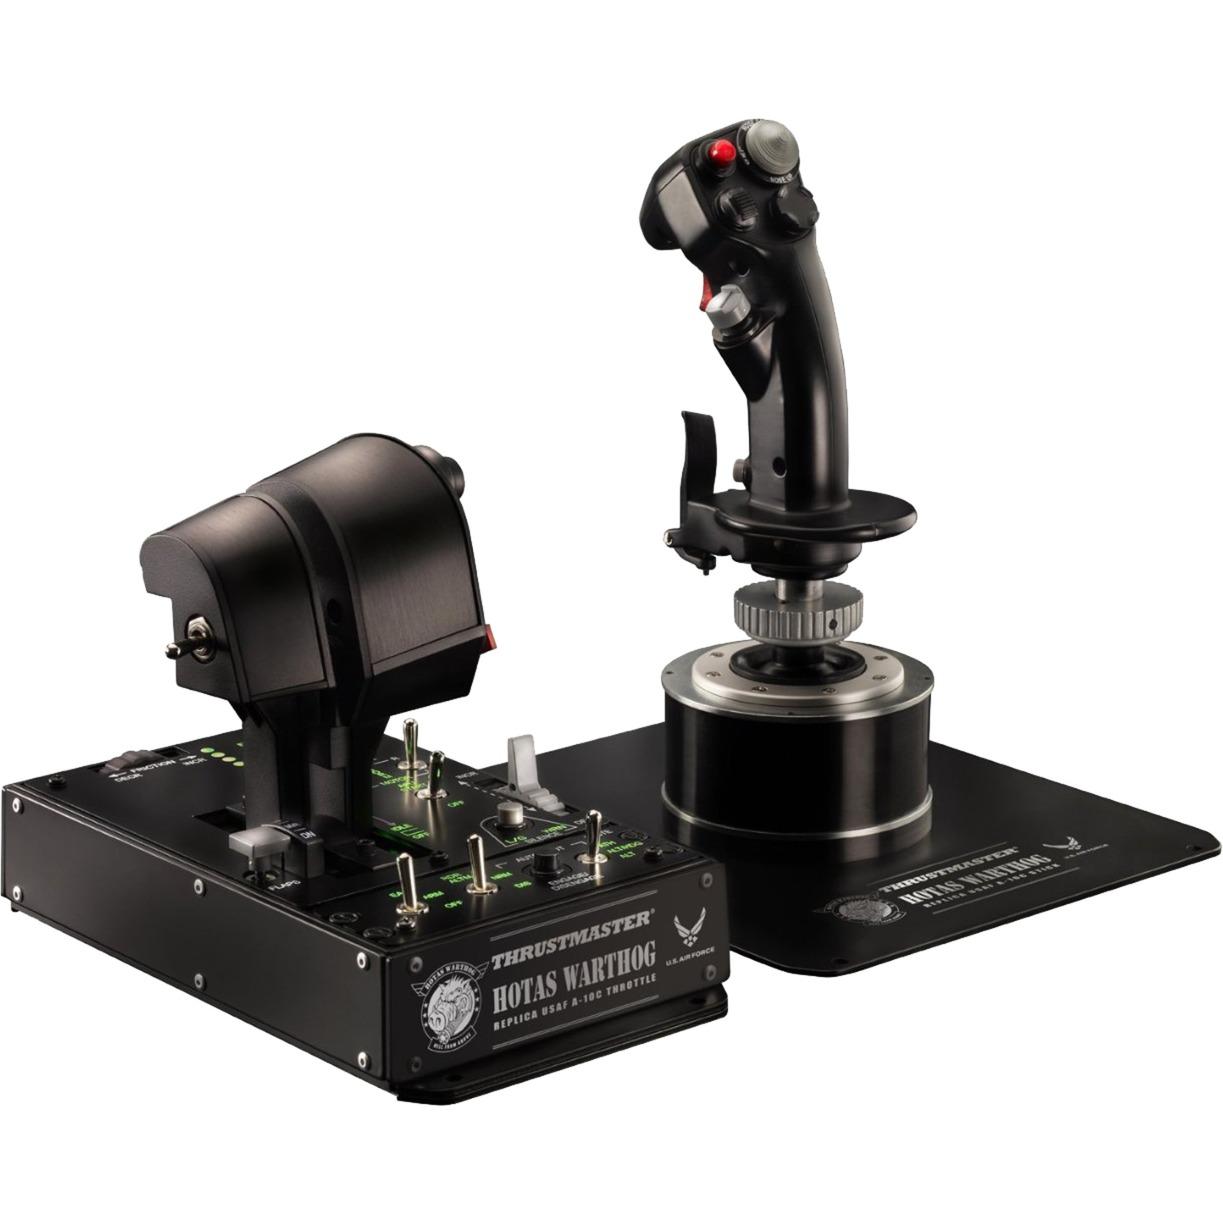 Hotas Warthog Palanca de mando PC, Joystick Negro, Hotas (mando más palanca de control)